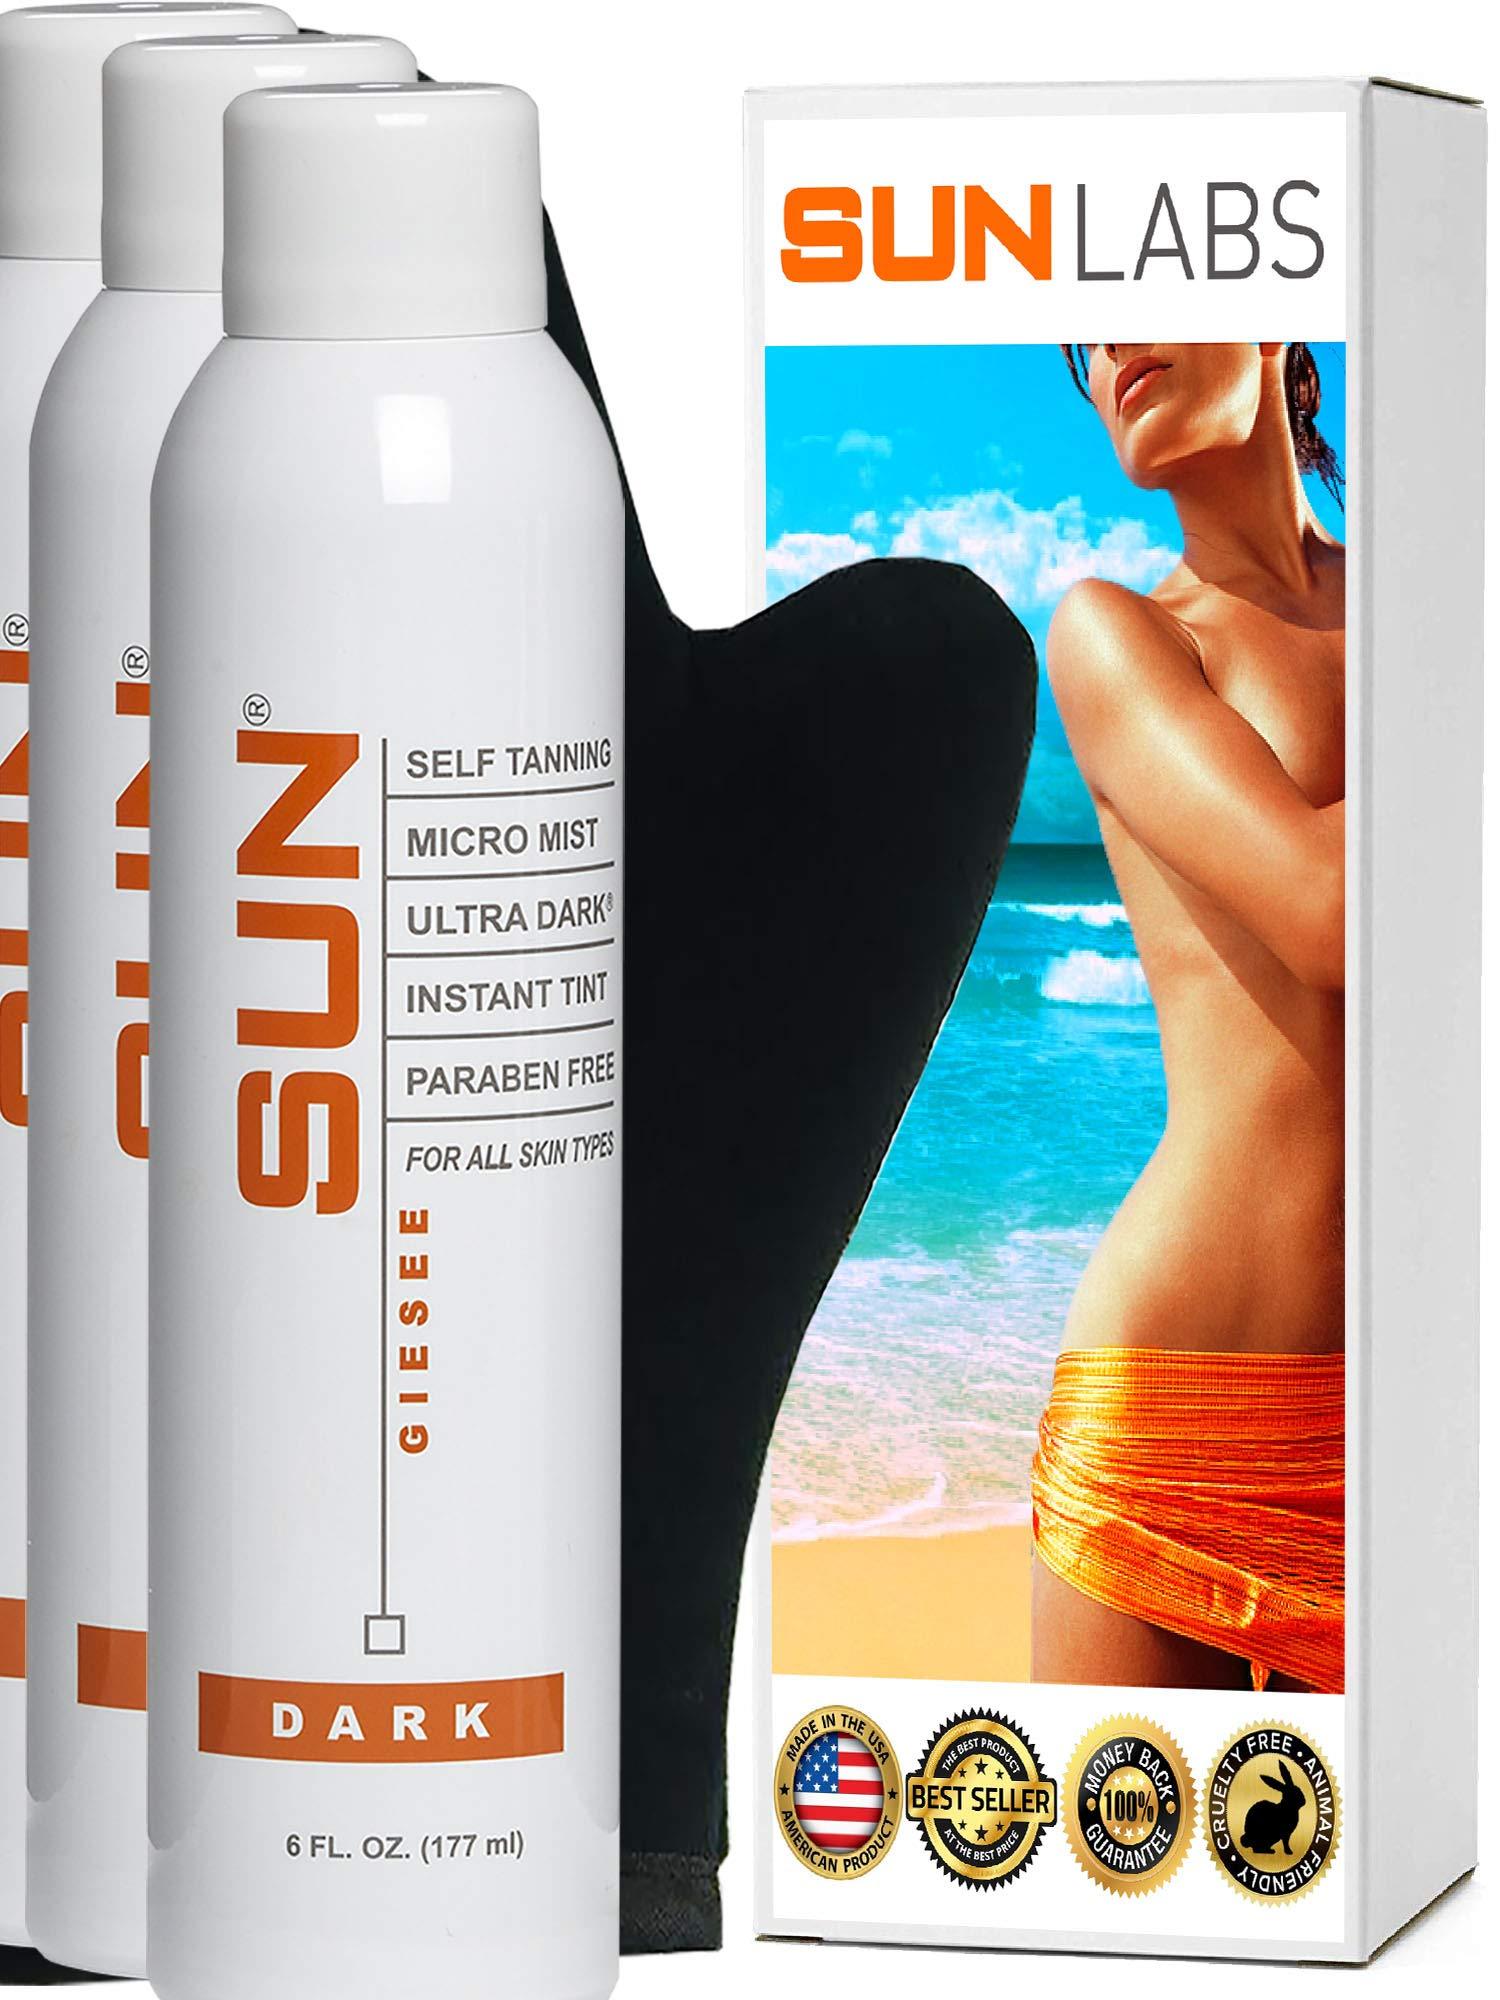 Spray Tan Organic Micro Mist Ultra Dark 6 oz (3 Pack)+ Tanning Mitt Natural Sunless Airbrush, Body and Face for Bronzing and Golden Tan - Dark Fake Tanning Airbrush (Packaging May Very)